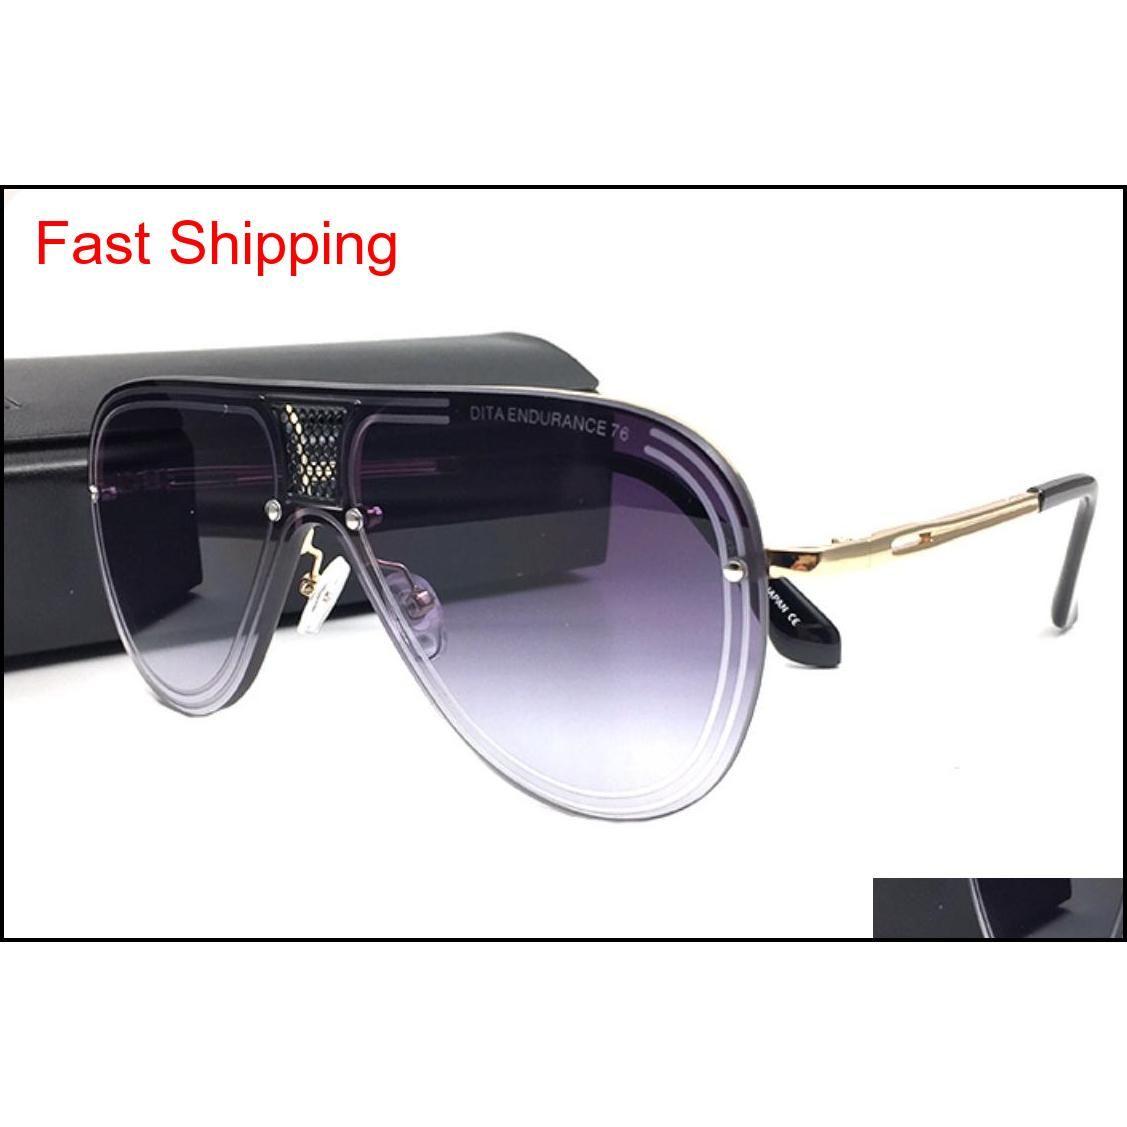 new luxury sunglasses men design metal vintage sunglass fashion style square metal frame oversized sun glasses uv 400 lens with case